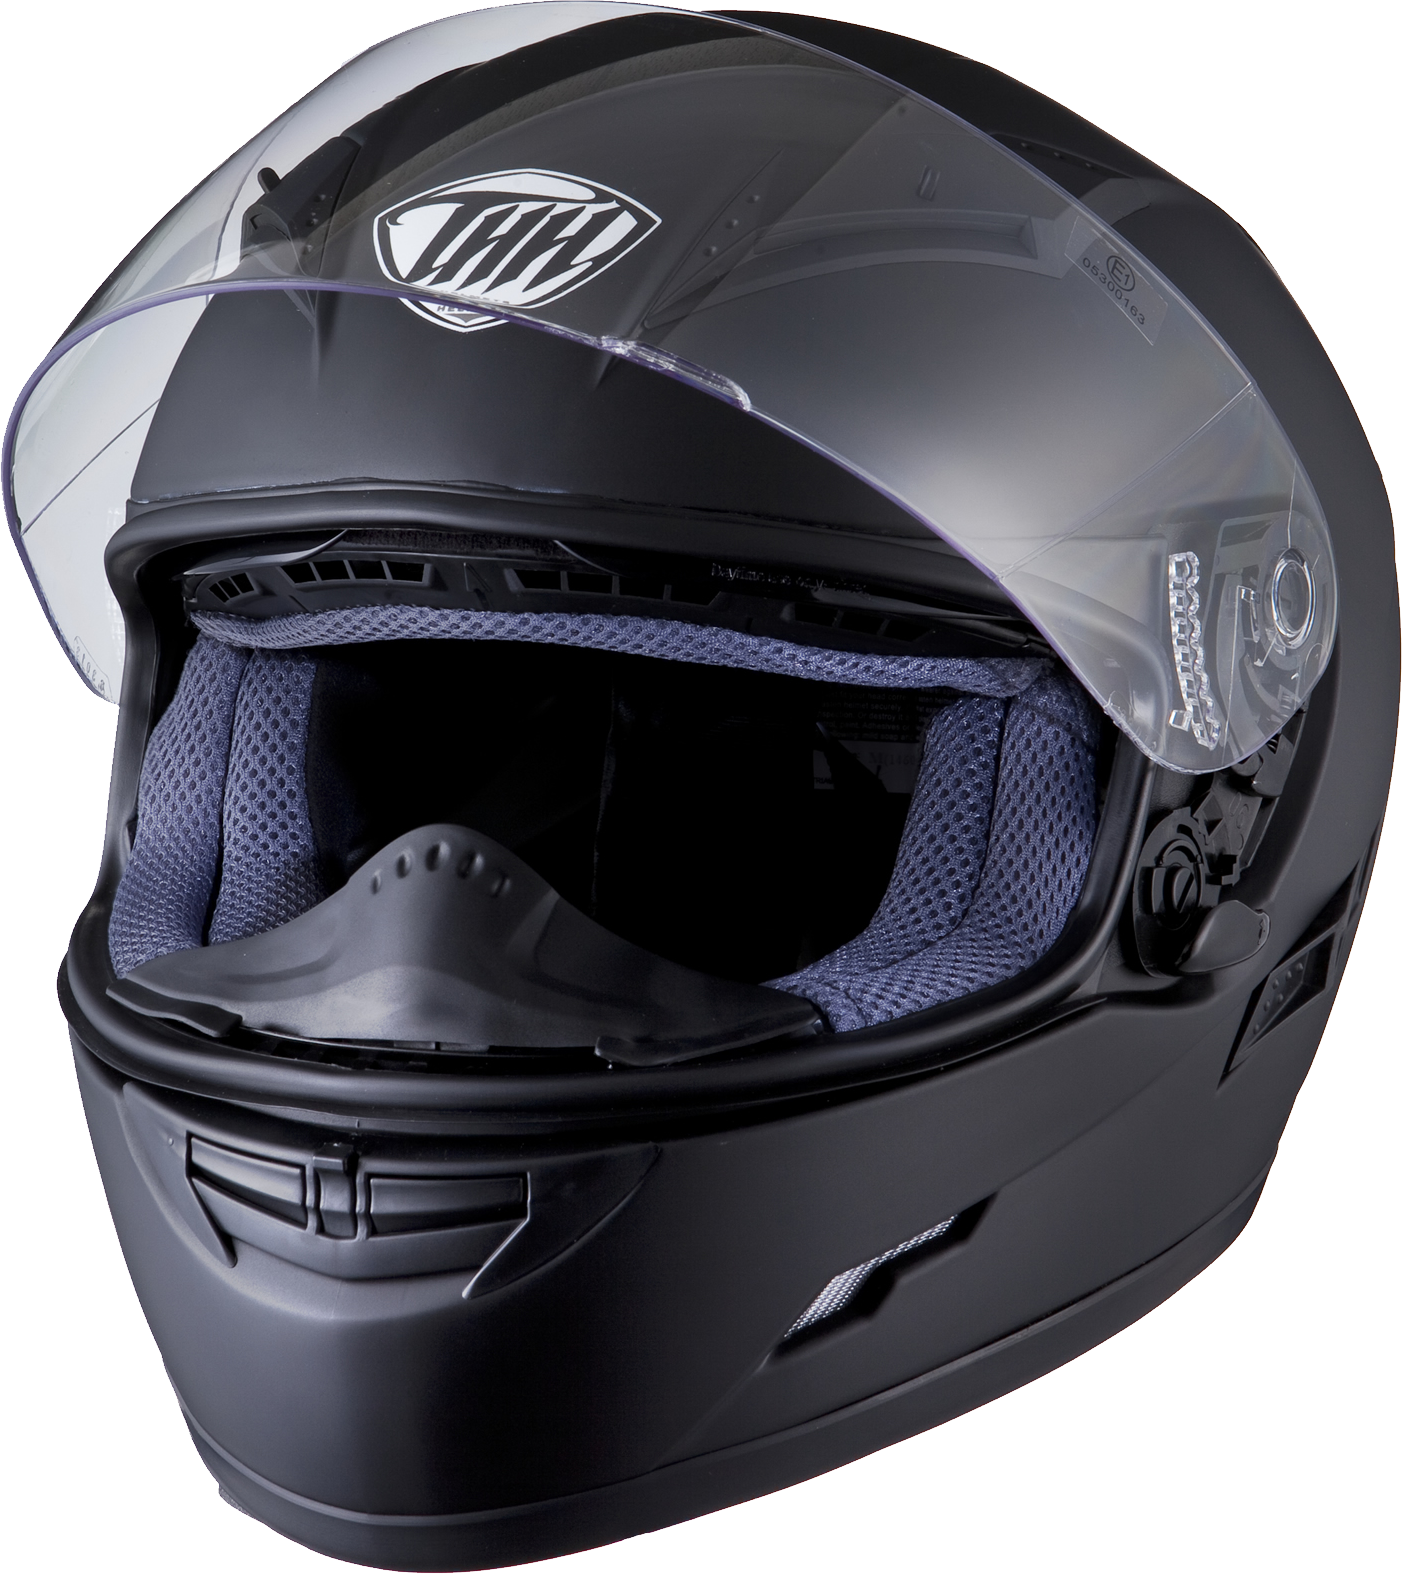 Image Result For Motorcycle Helmet